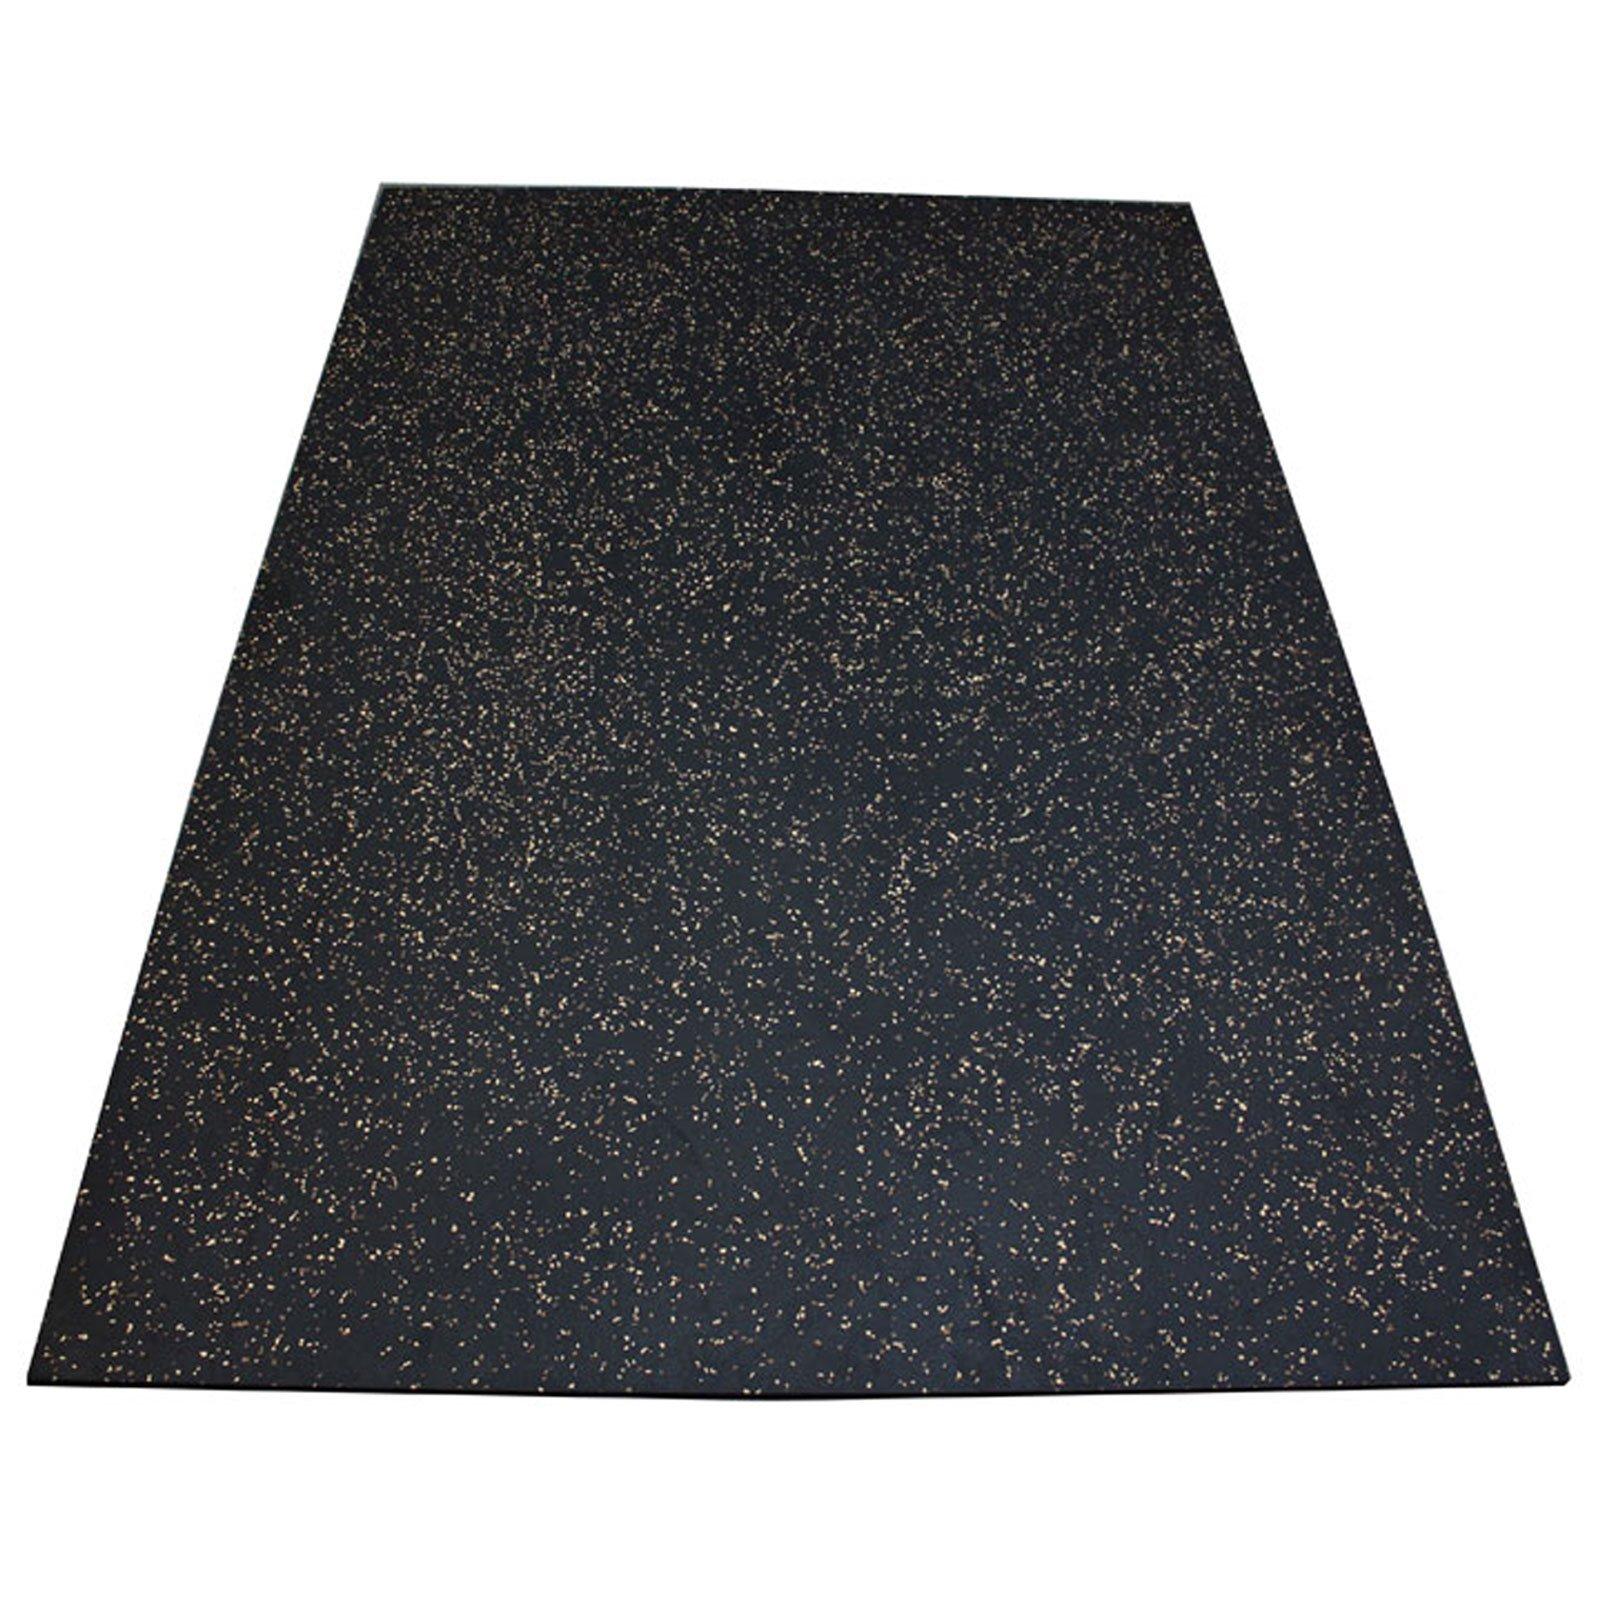 IncStores 4' X 6' Premium Durable Rubber Mat Home Or